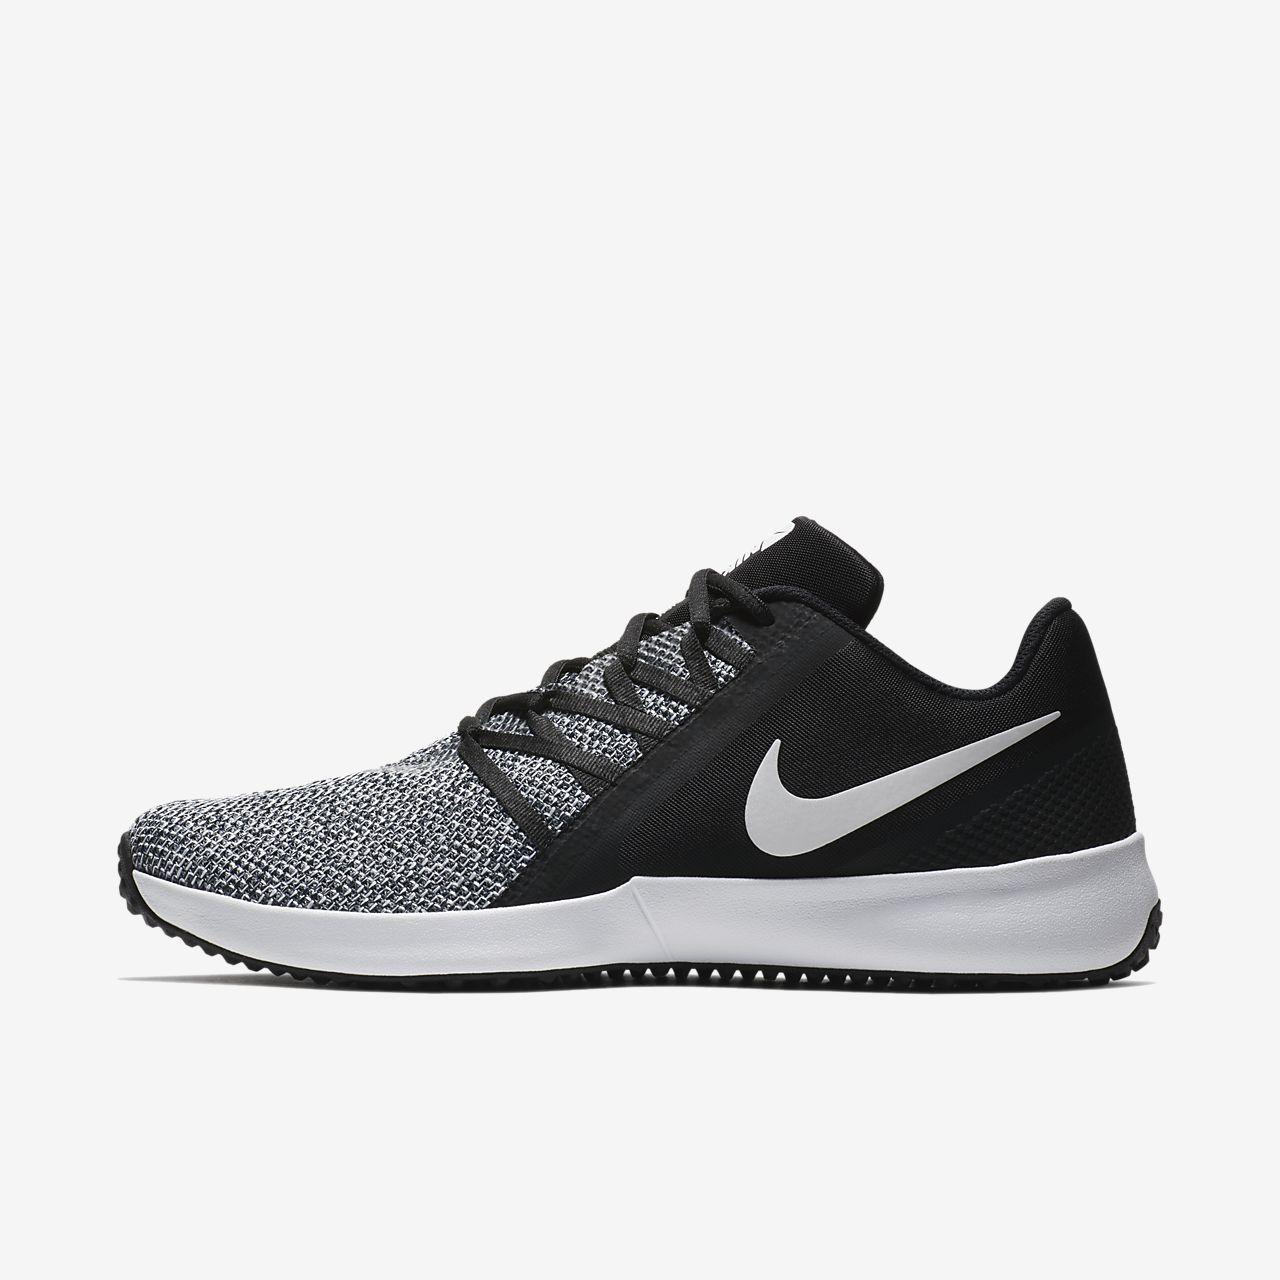 Compete herreNO Trainer treningssko Nike Varsity til zqSMVpU